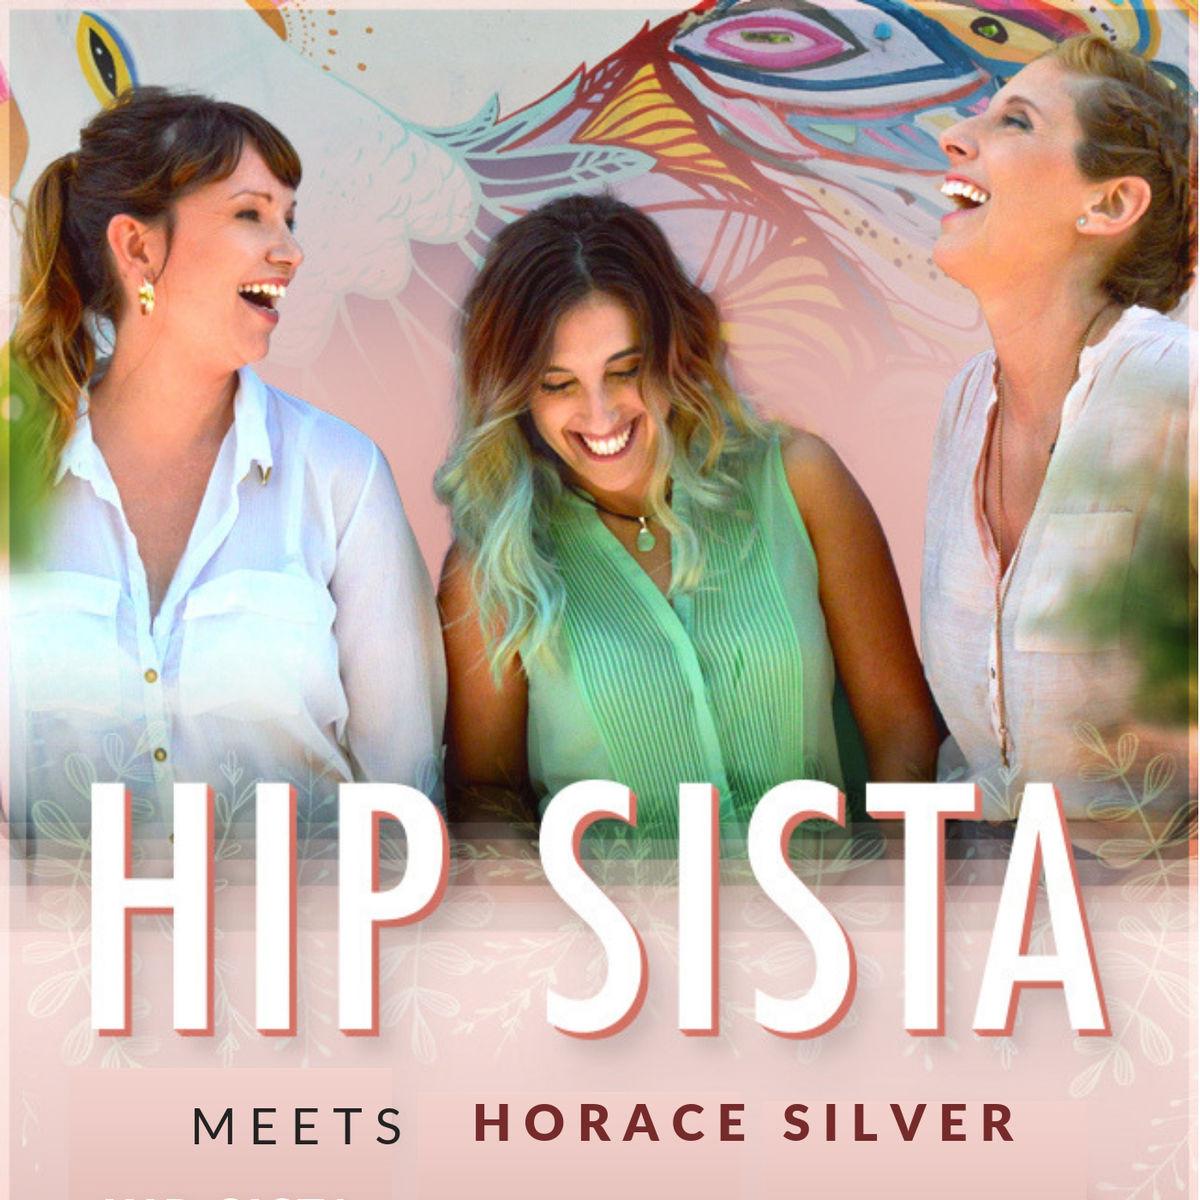 Hip Sista - Meets Horace Silver (2019)